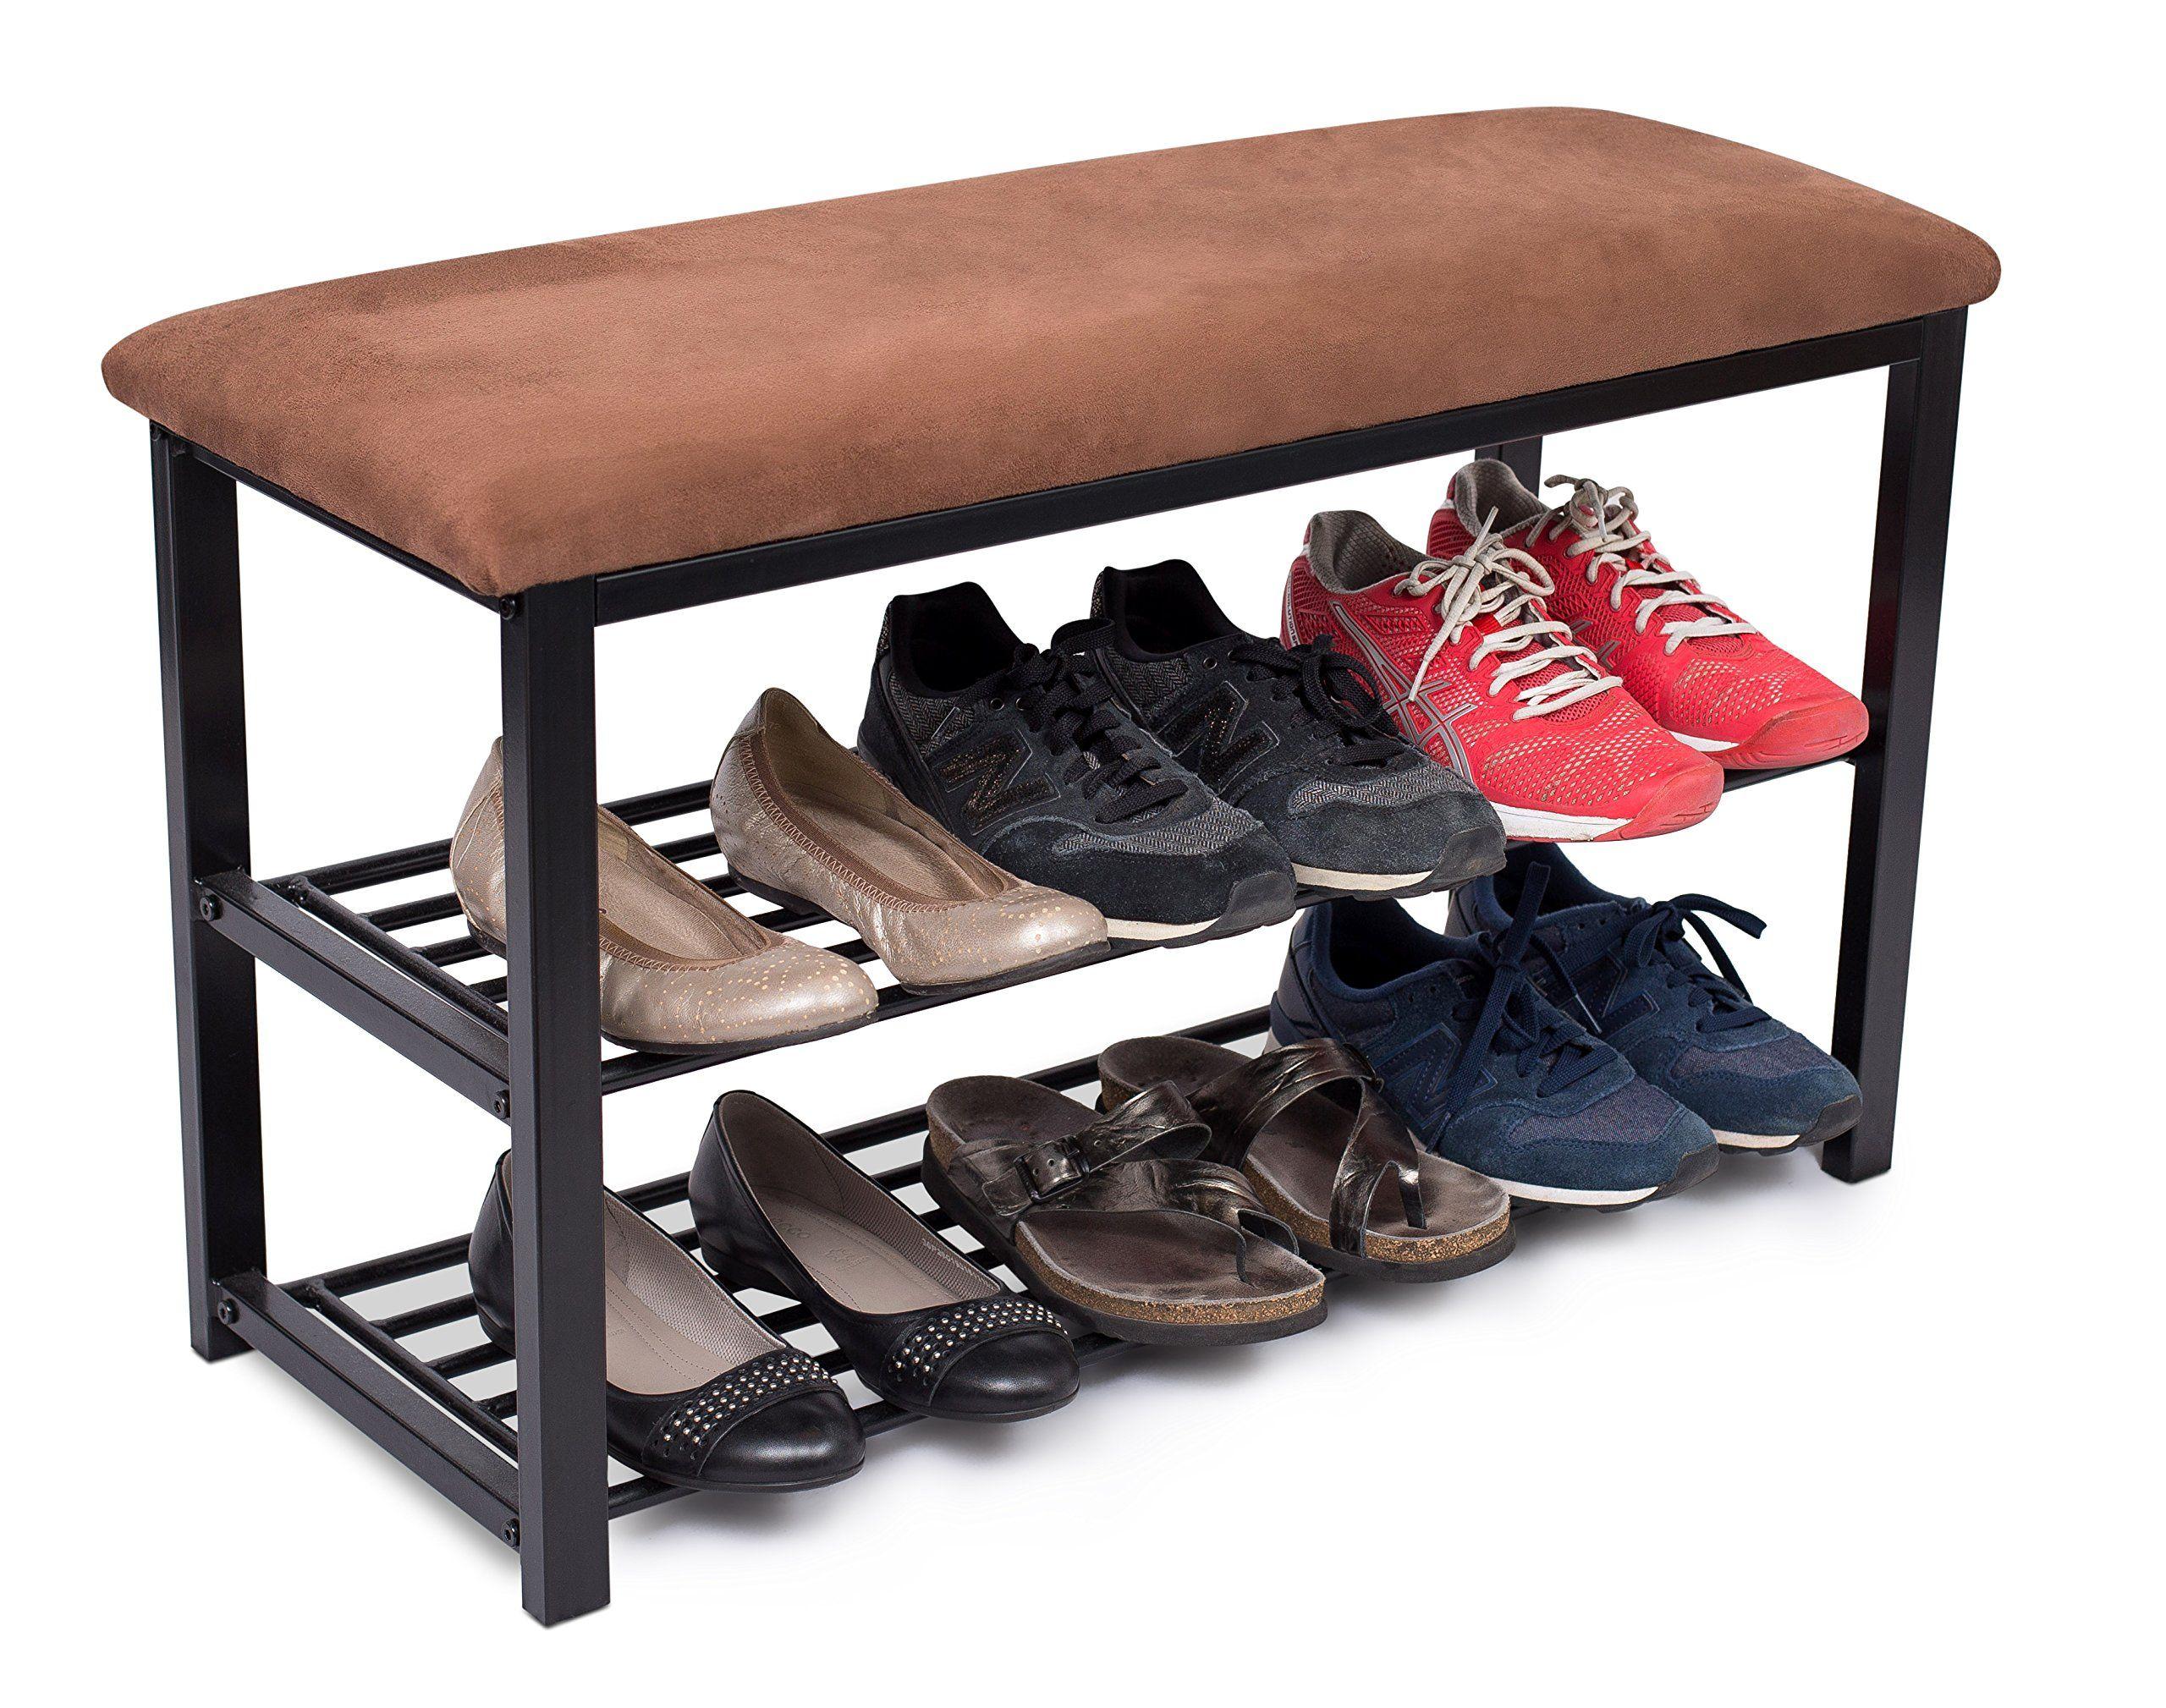 3 Tiers Shoe Shelf Brown ULBS06Z Entryway Storage Organizer Multi Function for Hallway Bathroom Living Room Corridor and Garden SONGMICS Bamboo Shoe Rack Bench for Boots